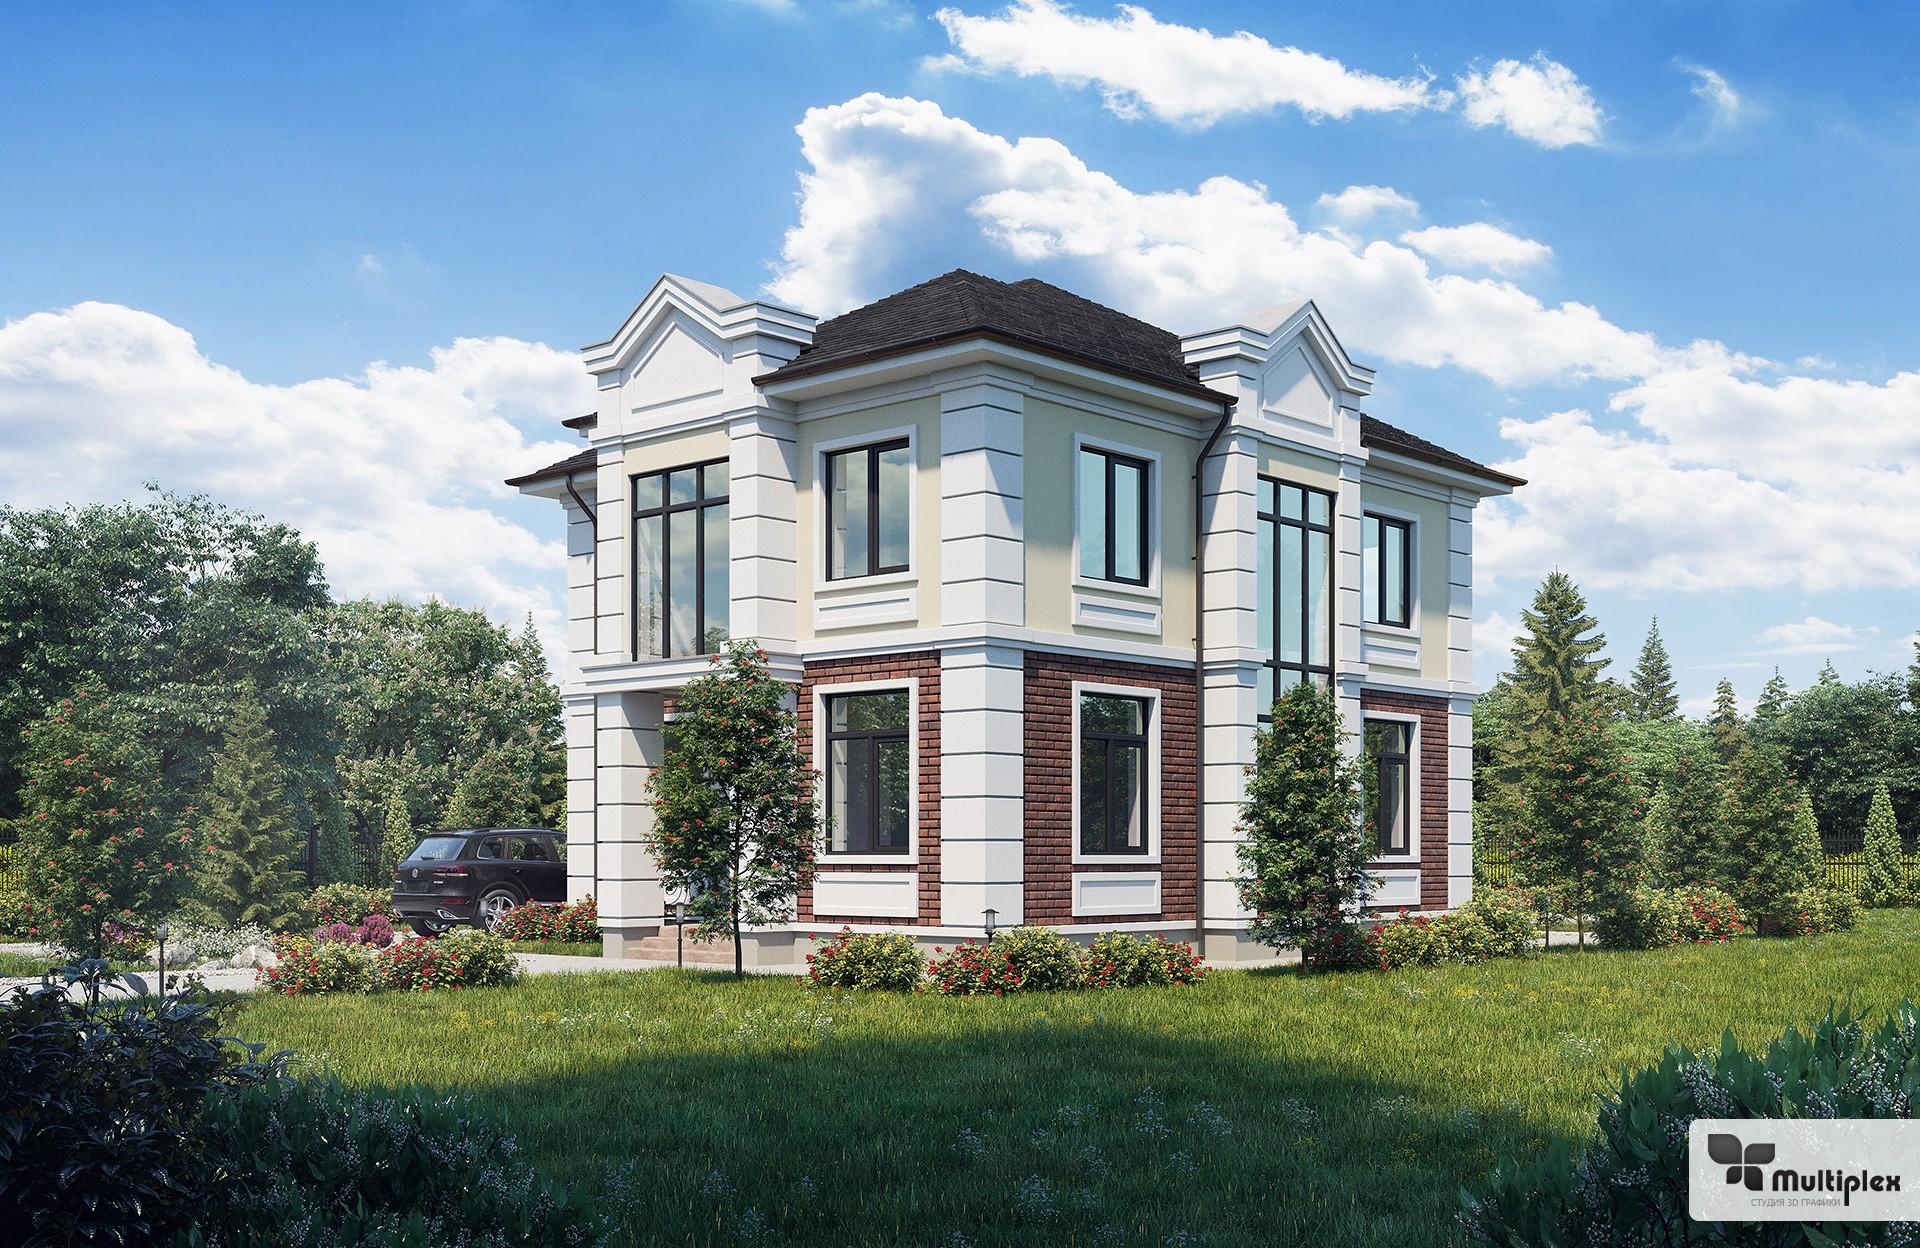 3D визуализация коттеджей и зданий